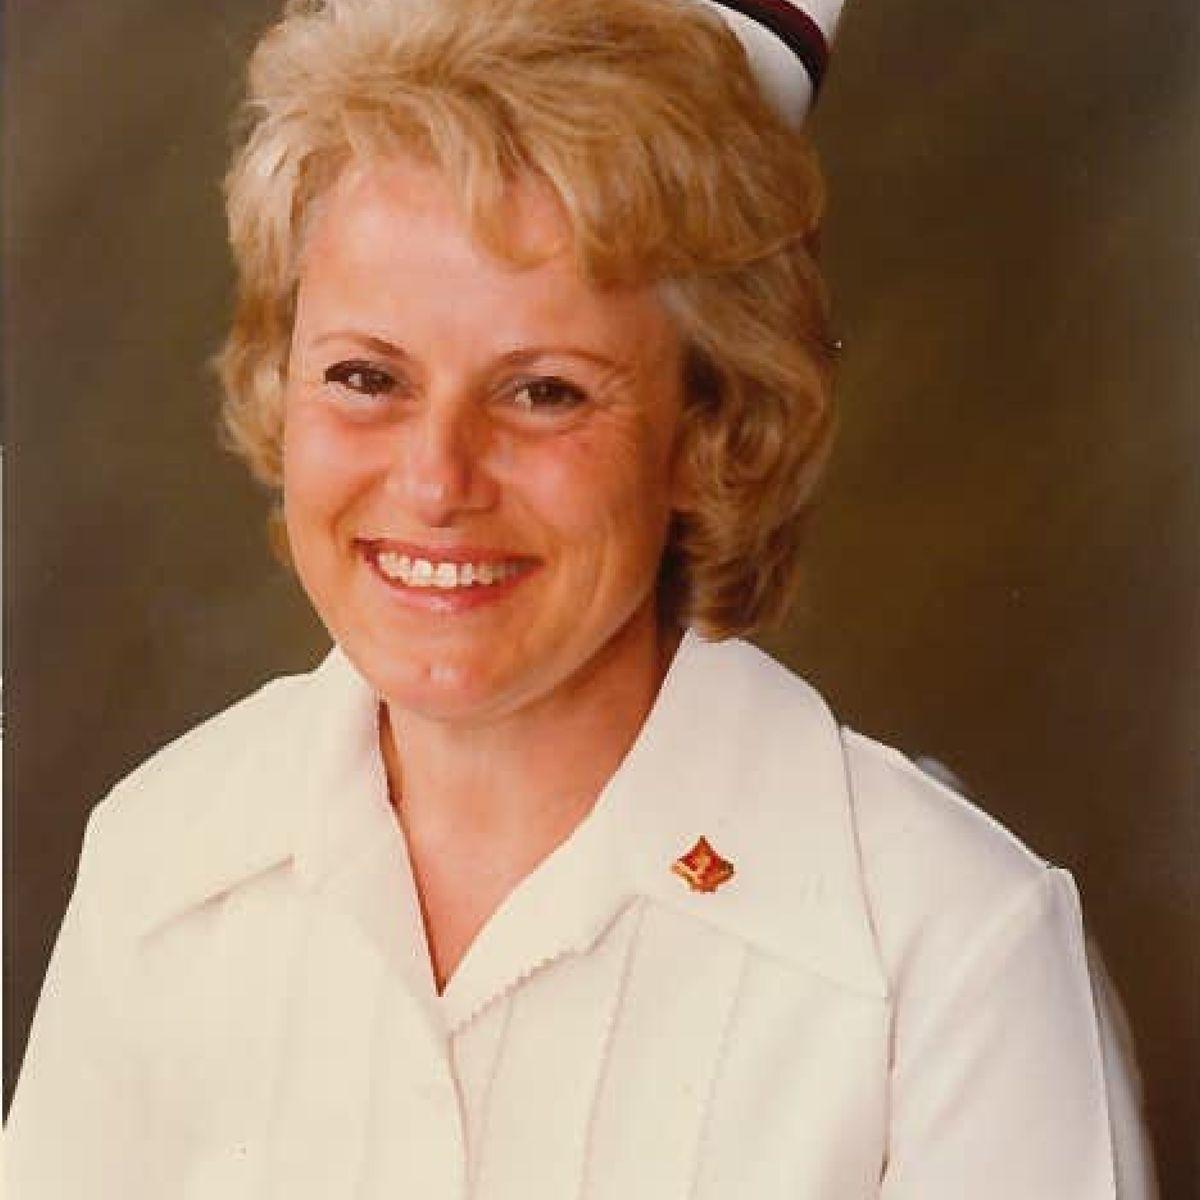 Vyta T. Smith, 85, of Clayton